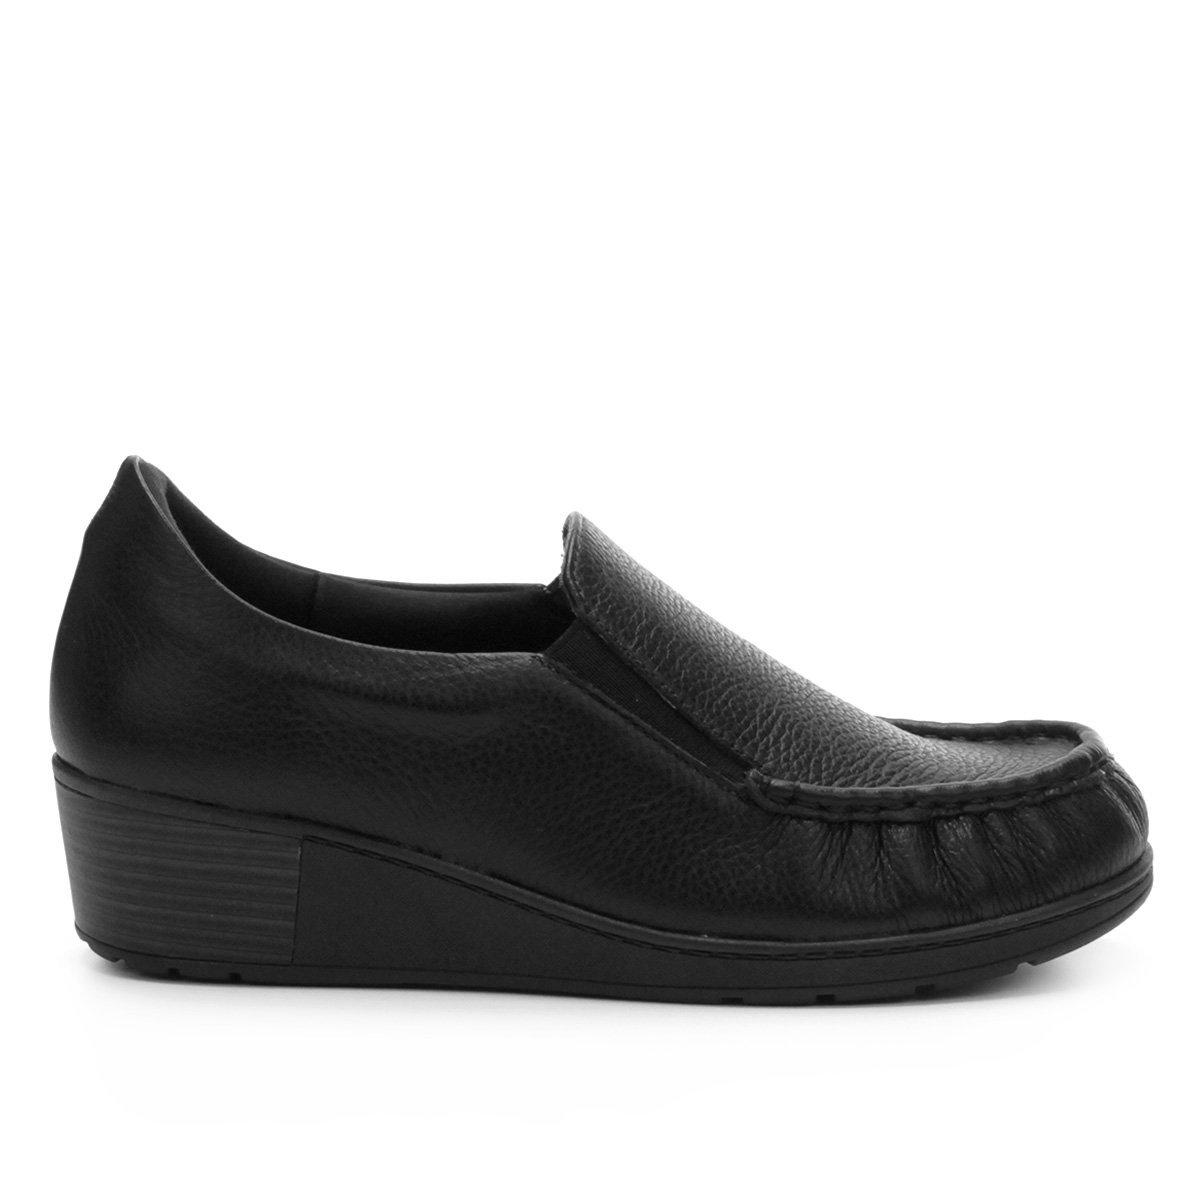 Preto On Sapato Feminino Médio Couro Sapato Slip Usaflex Slip Salto qazatZR